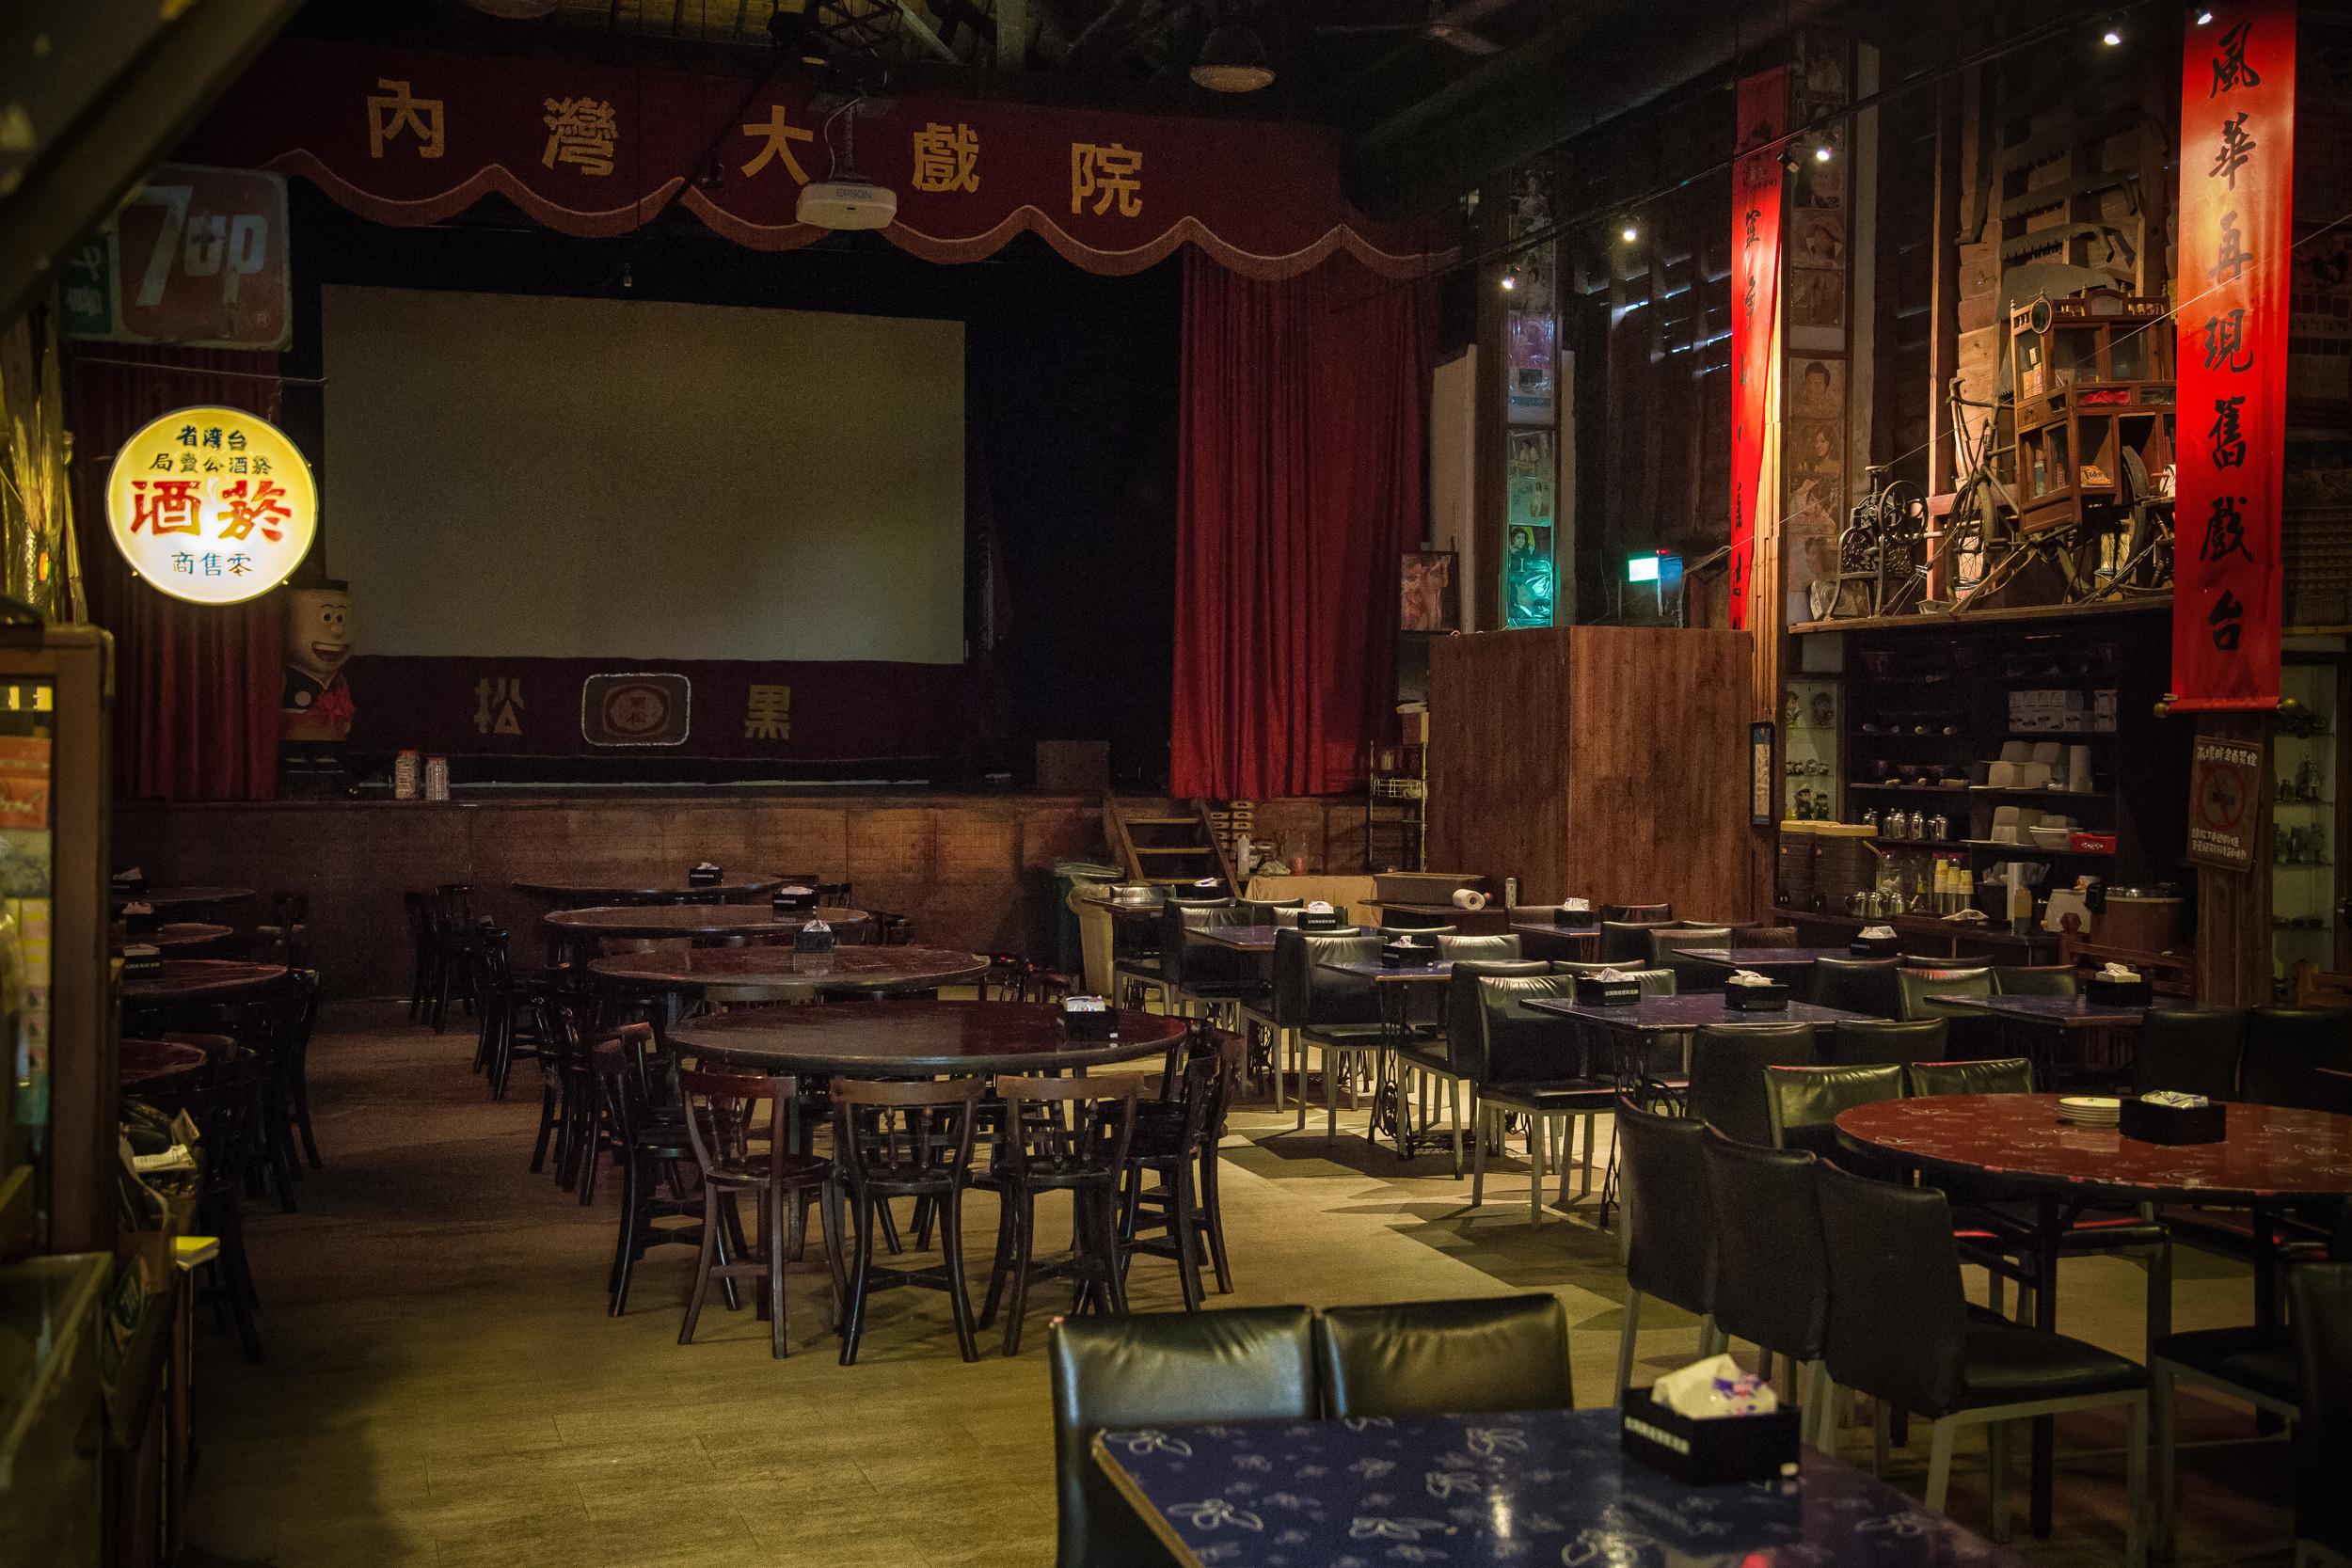 The inside of Neiwan Theatre (內灣戲院)